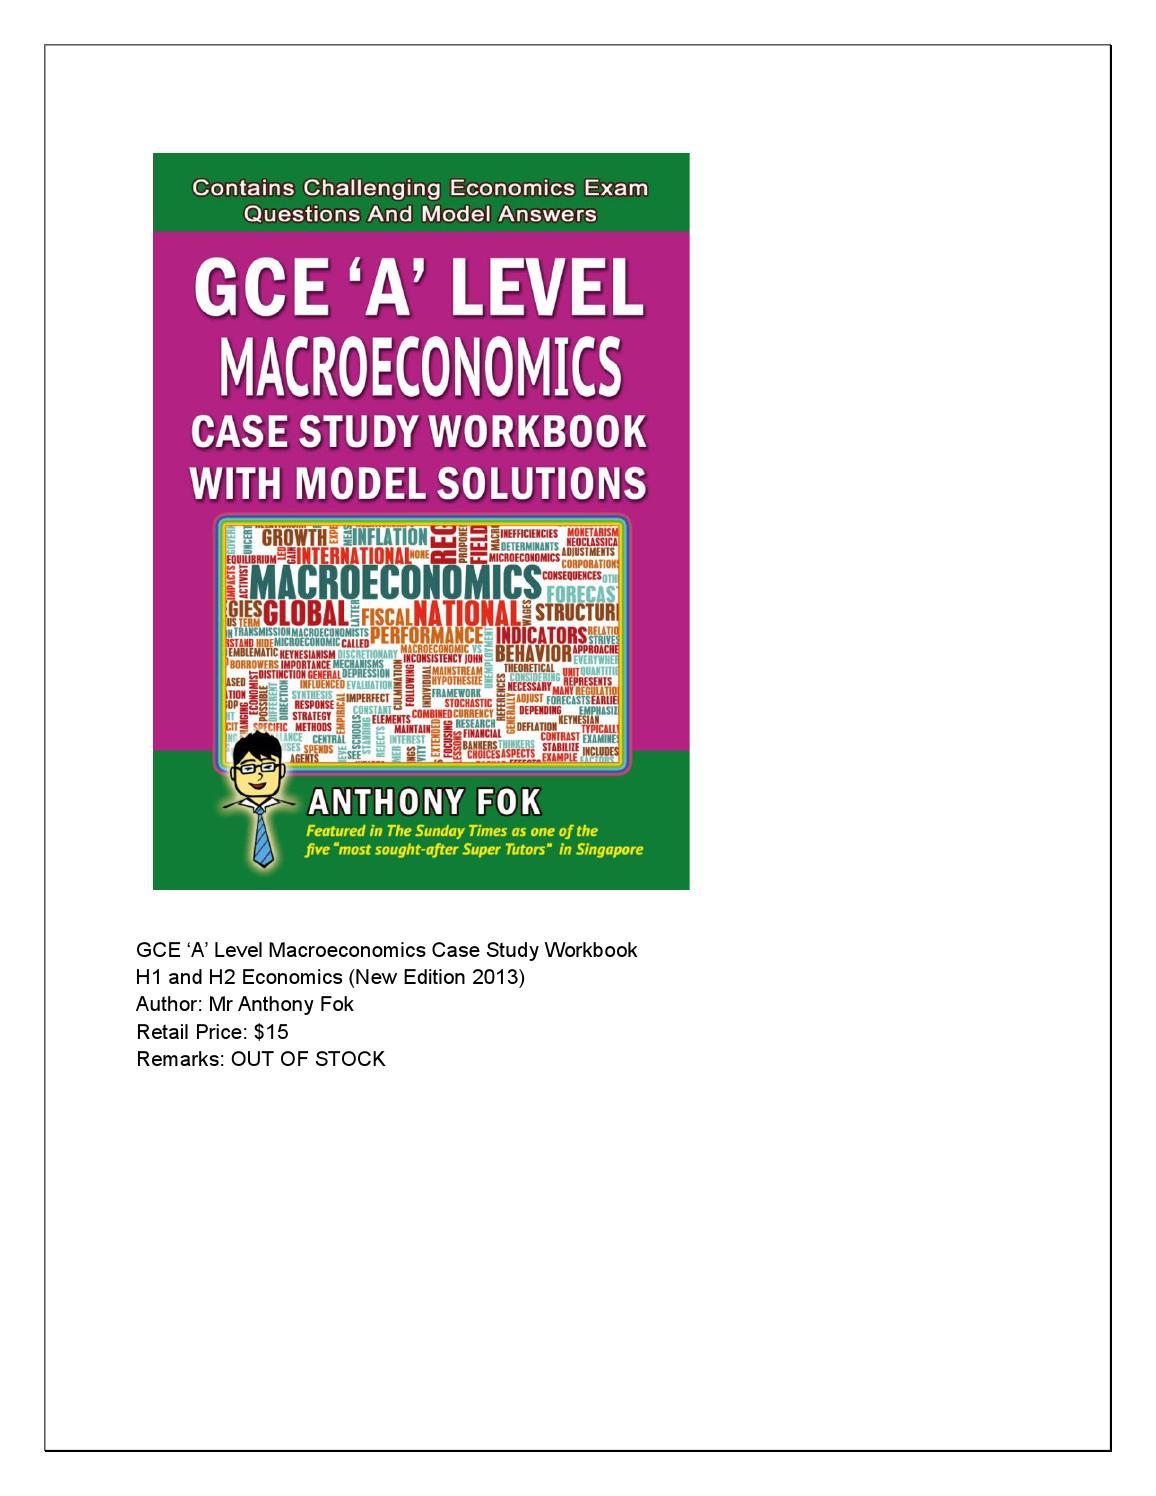 Economics Tuition Institute by JCEconomics Tuition - issuu